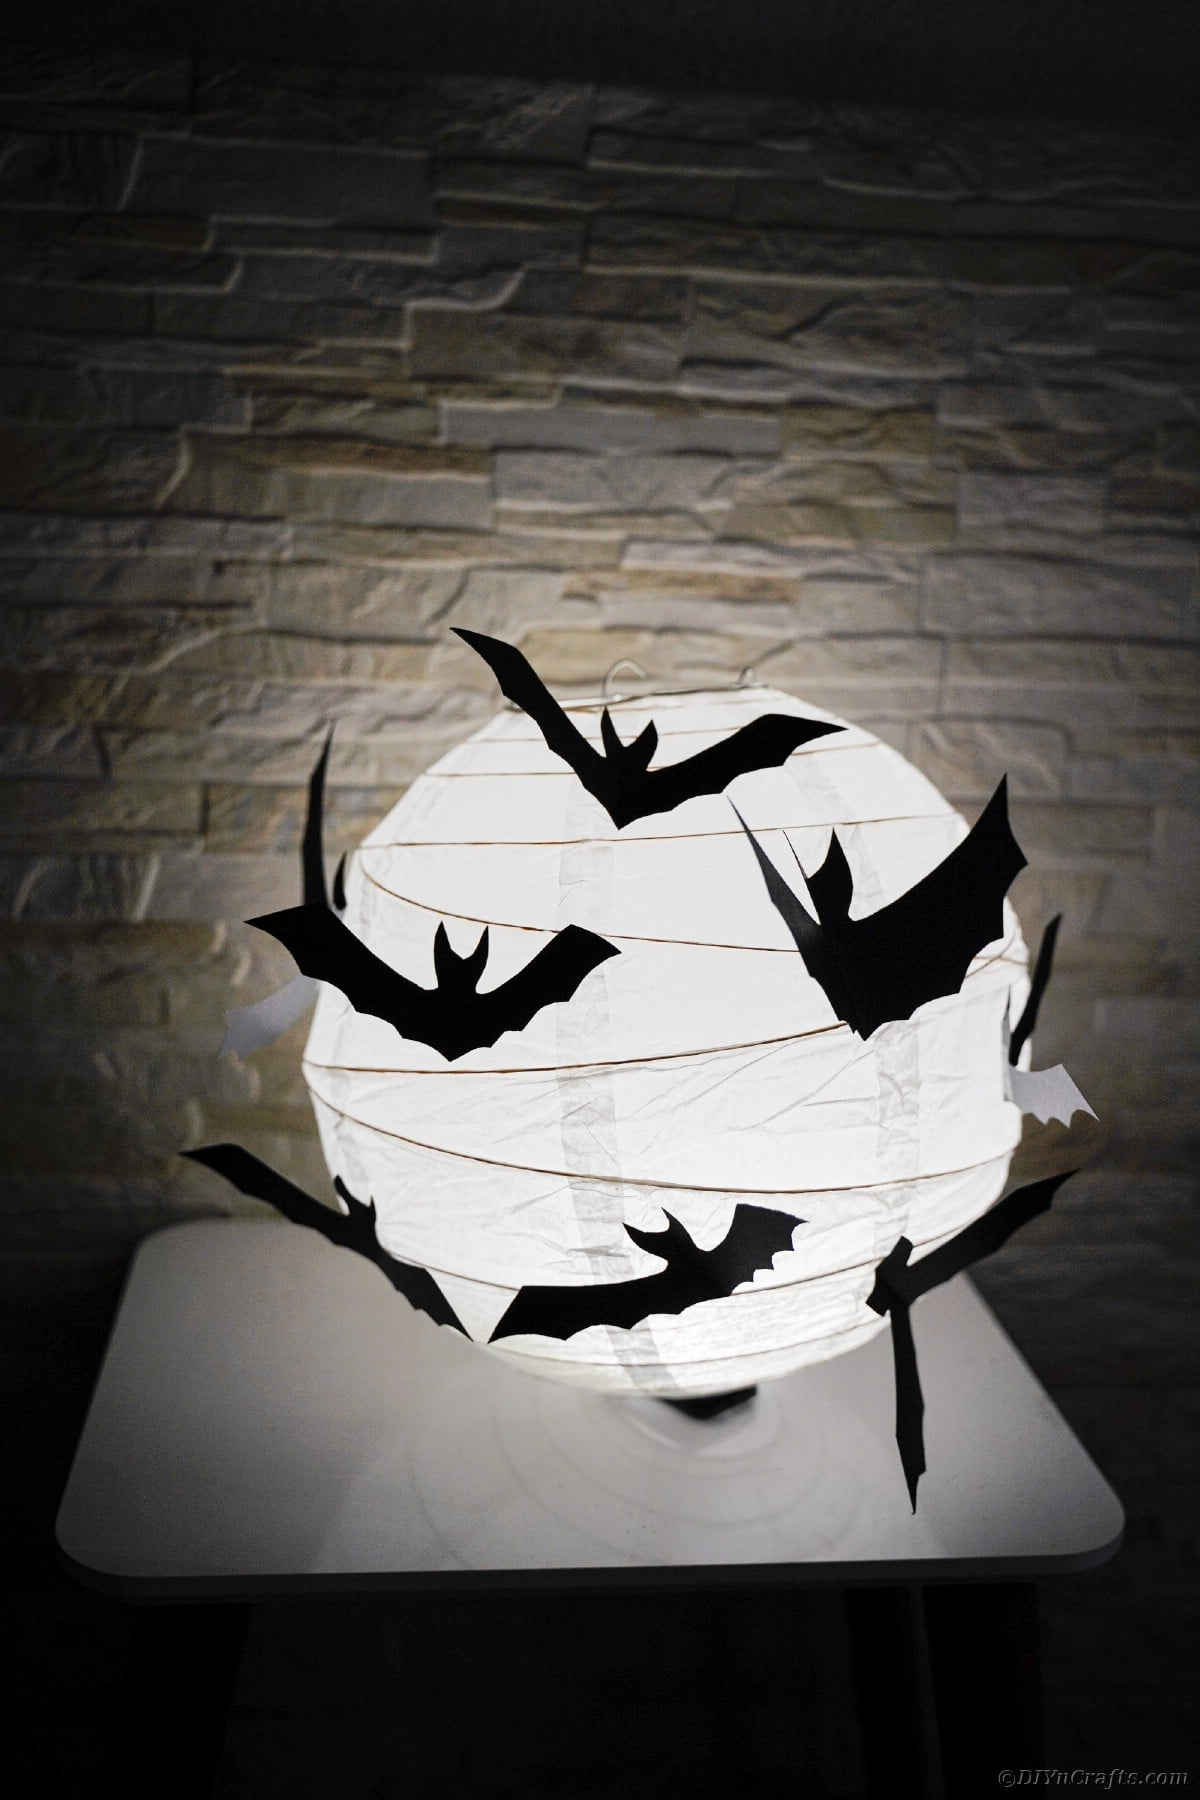 Paper bat lantern on table